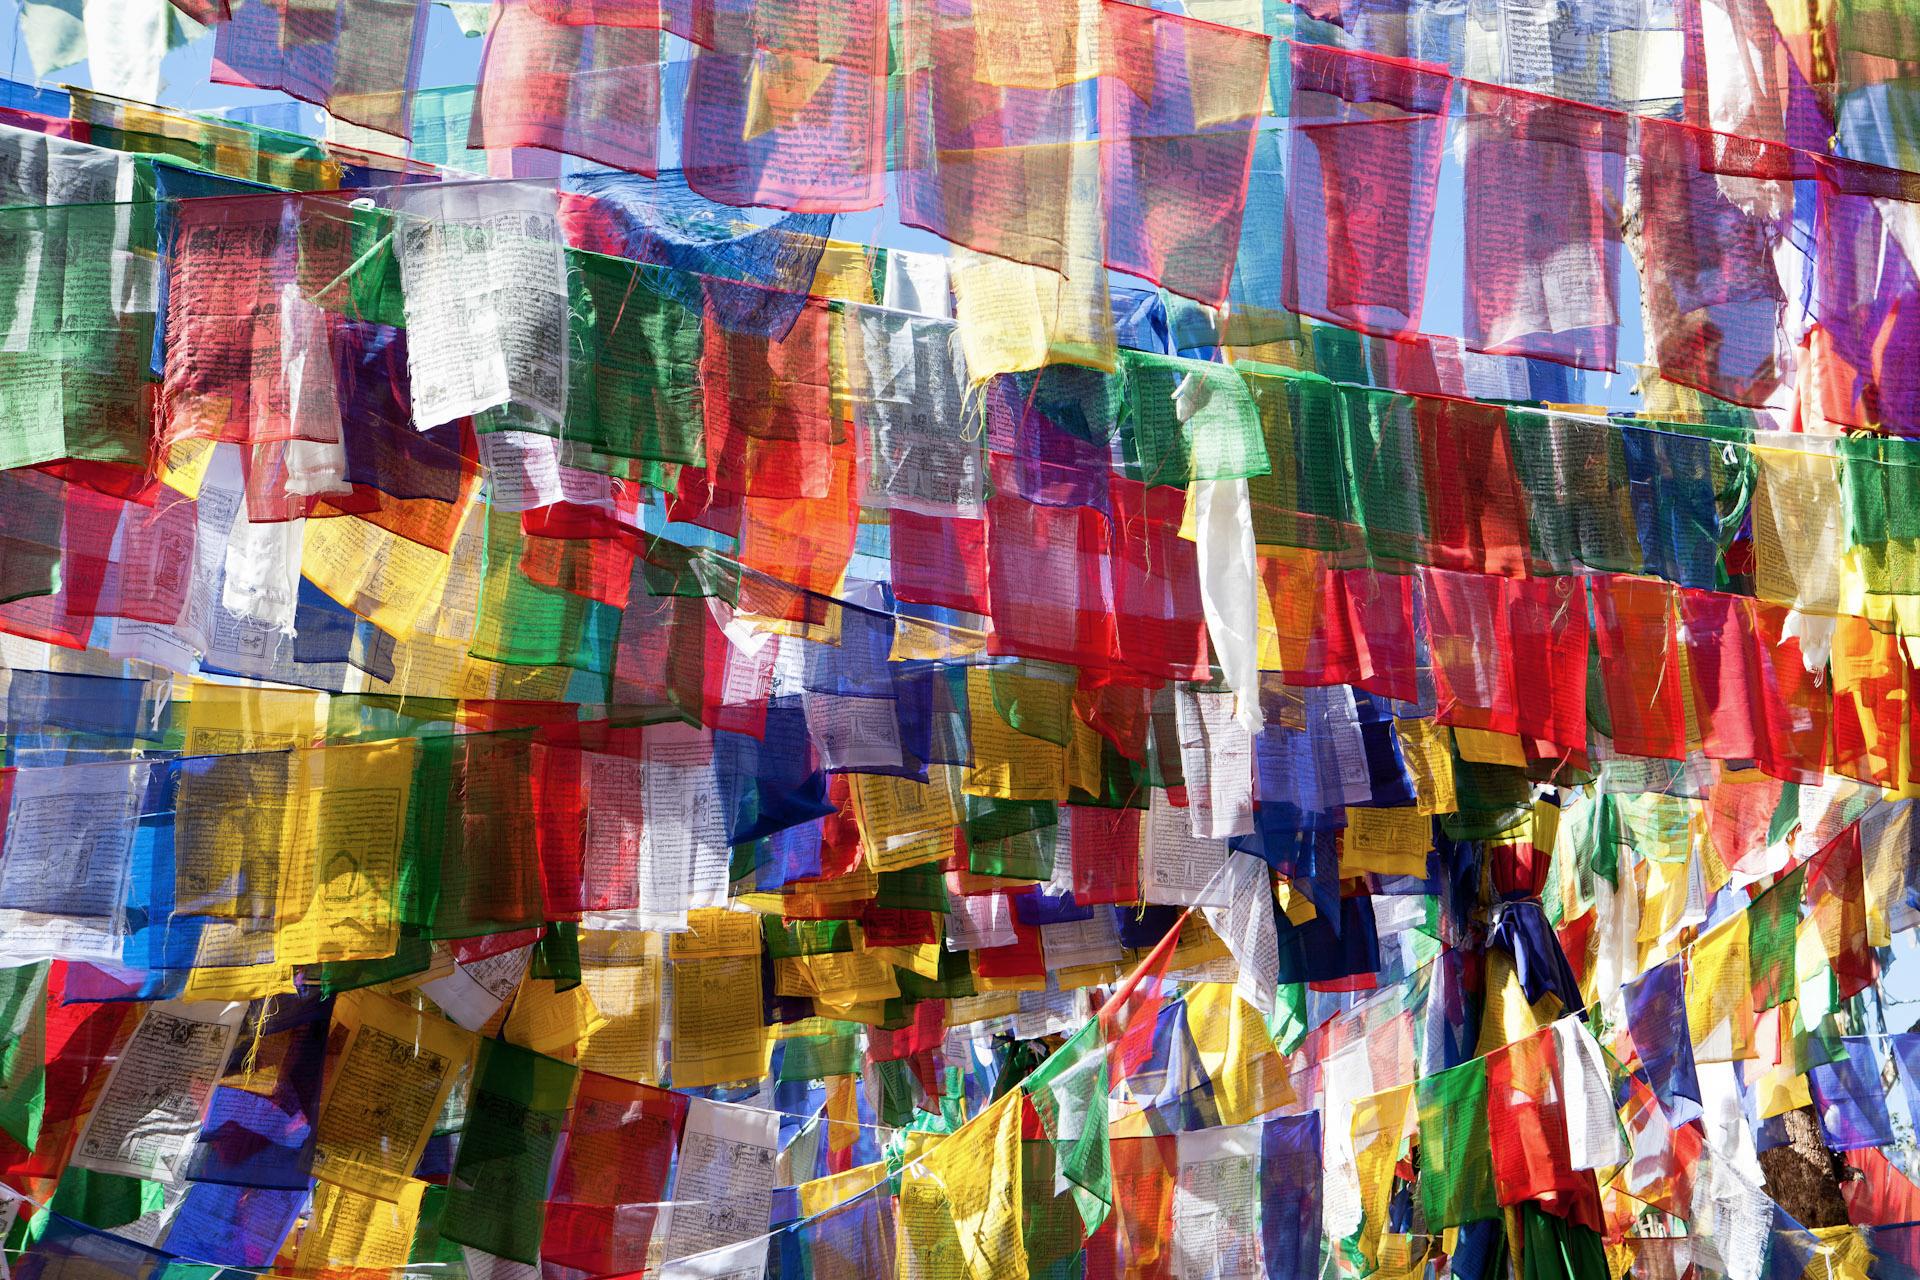 Jason_Bax_Travel_India-Darjeeling-Sikkim-Prayer-Flags.JPG